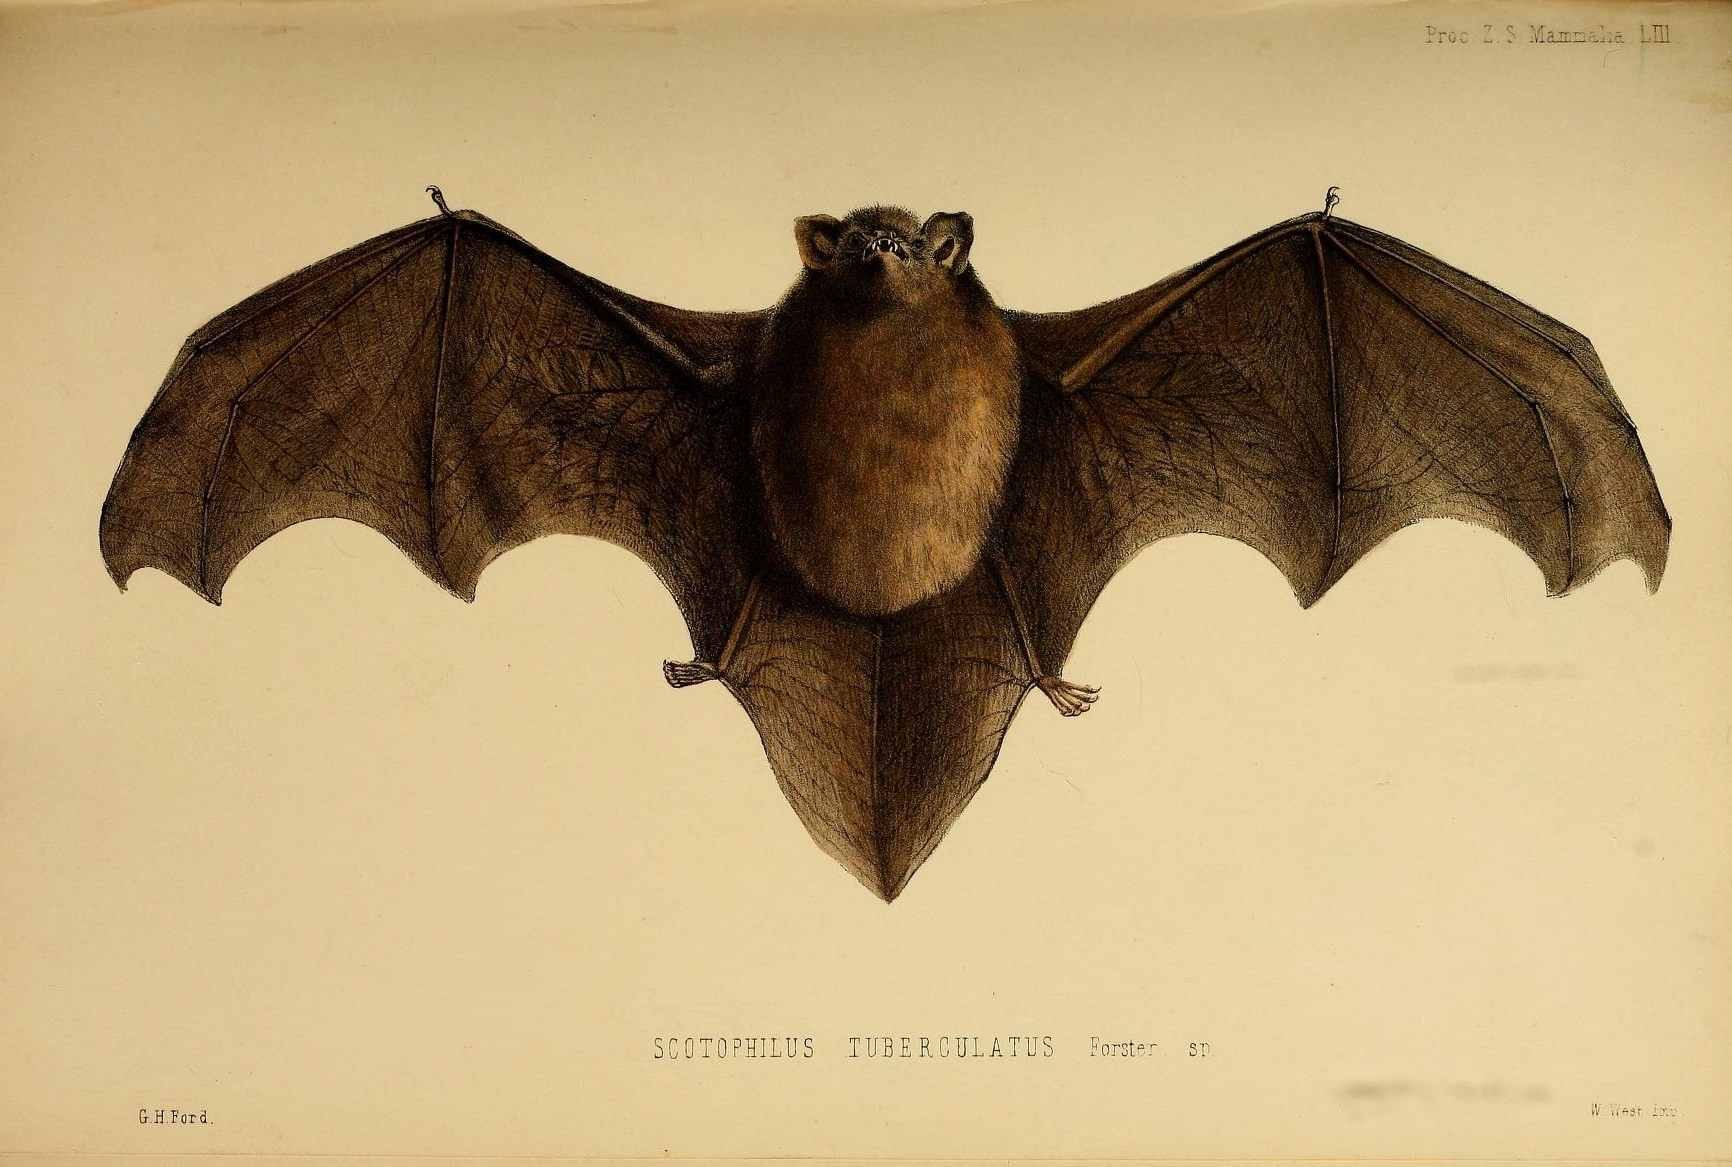 Image of Long-tailed Wattled Bat